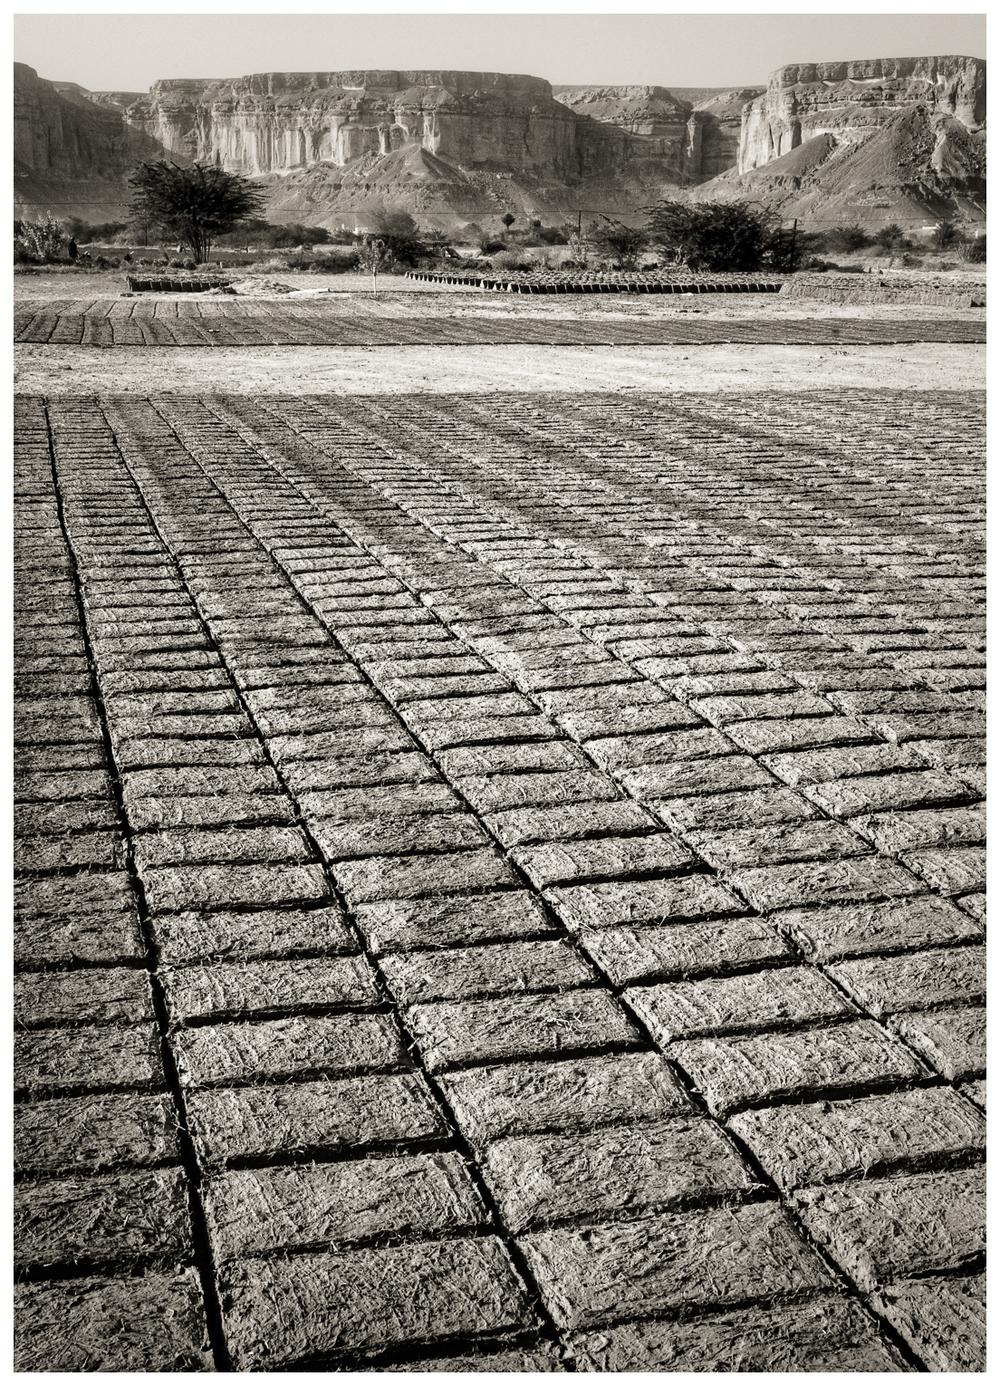 23Drying Bricks in the Wadi HadhramautWadi Hadhramaut Drying Bricks_DSC4897.jpg